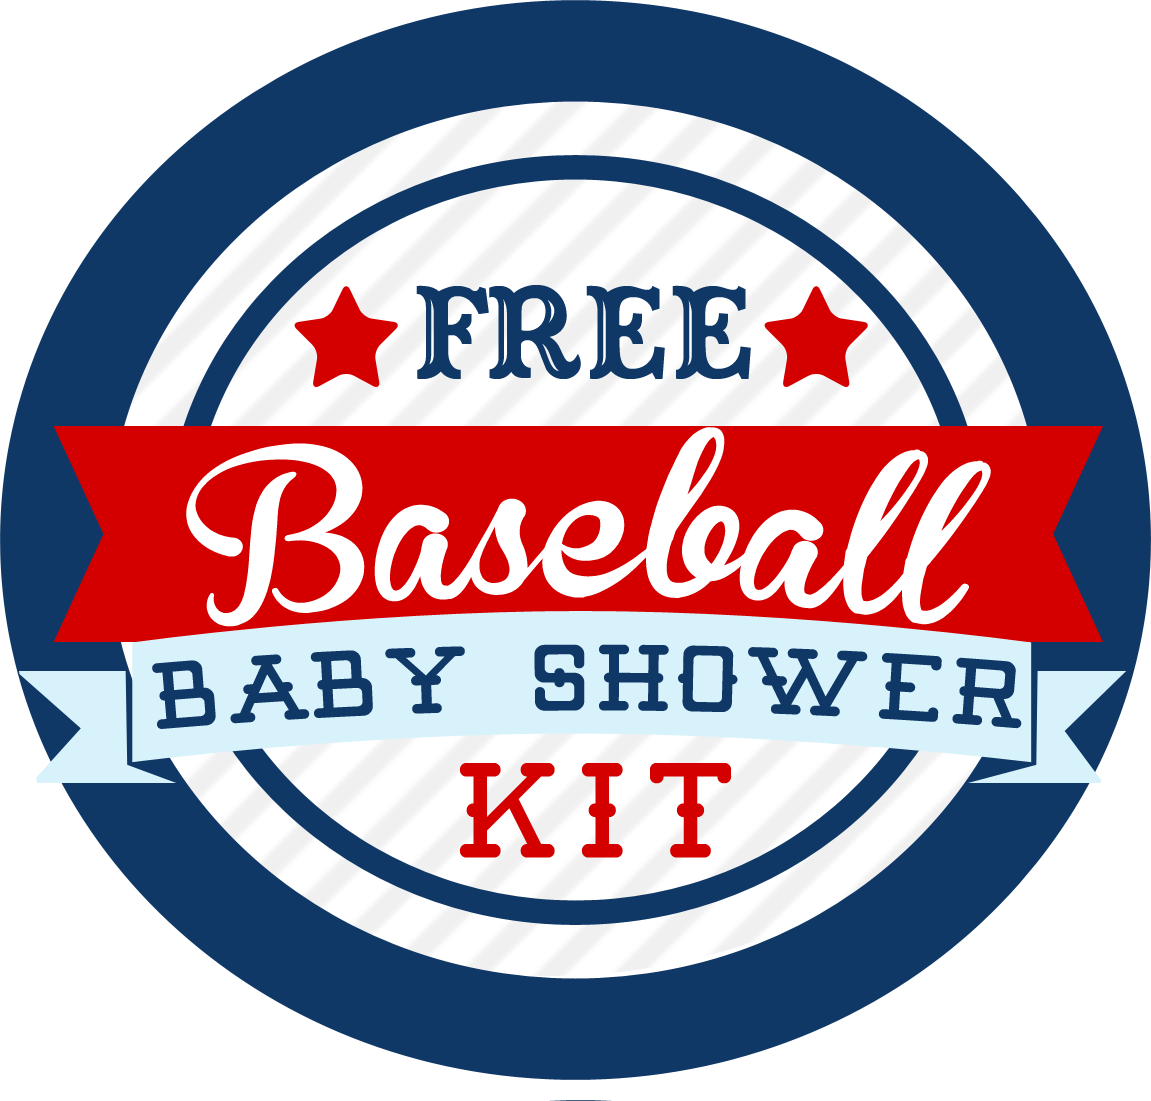 free baseball baby shower kit